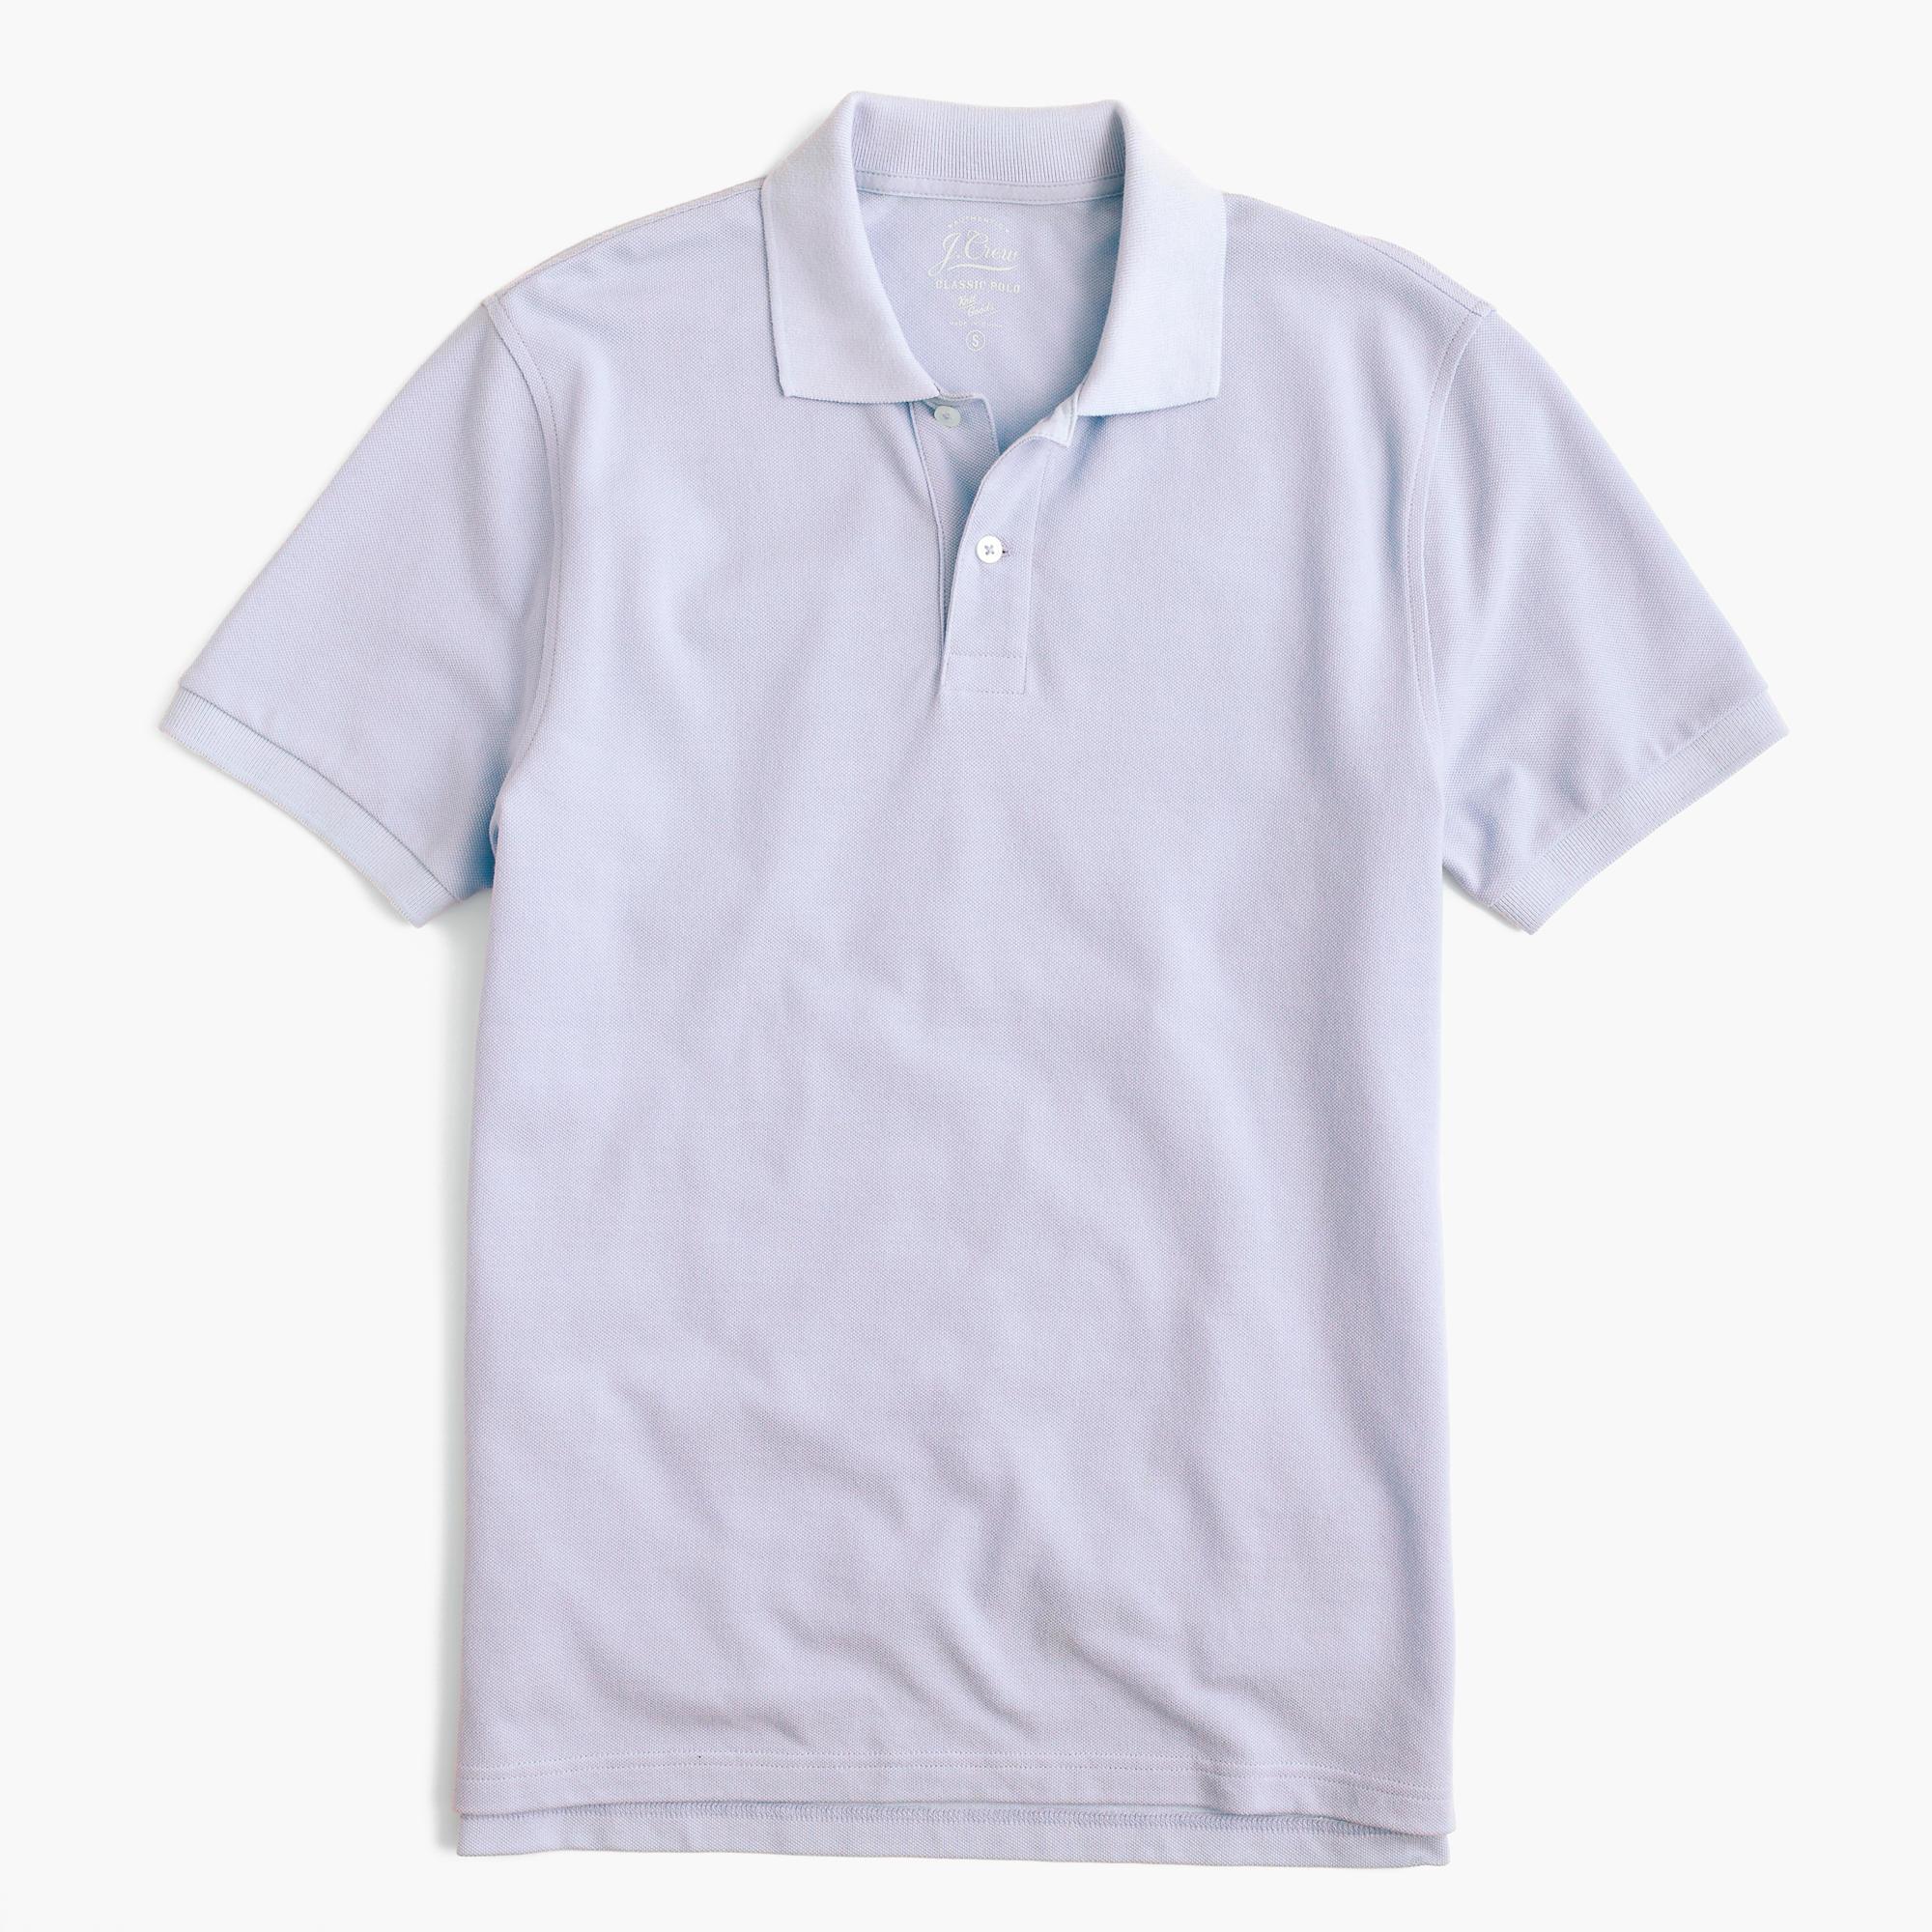 768c83a22 Lyst - J.Crew Classic Piqué Polo Shirt for Men